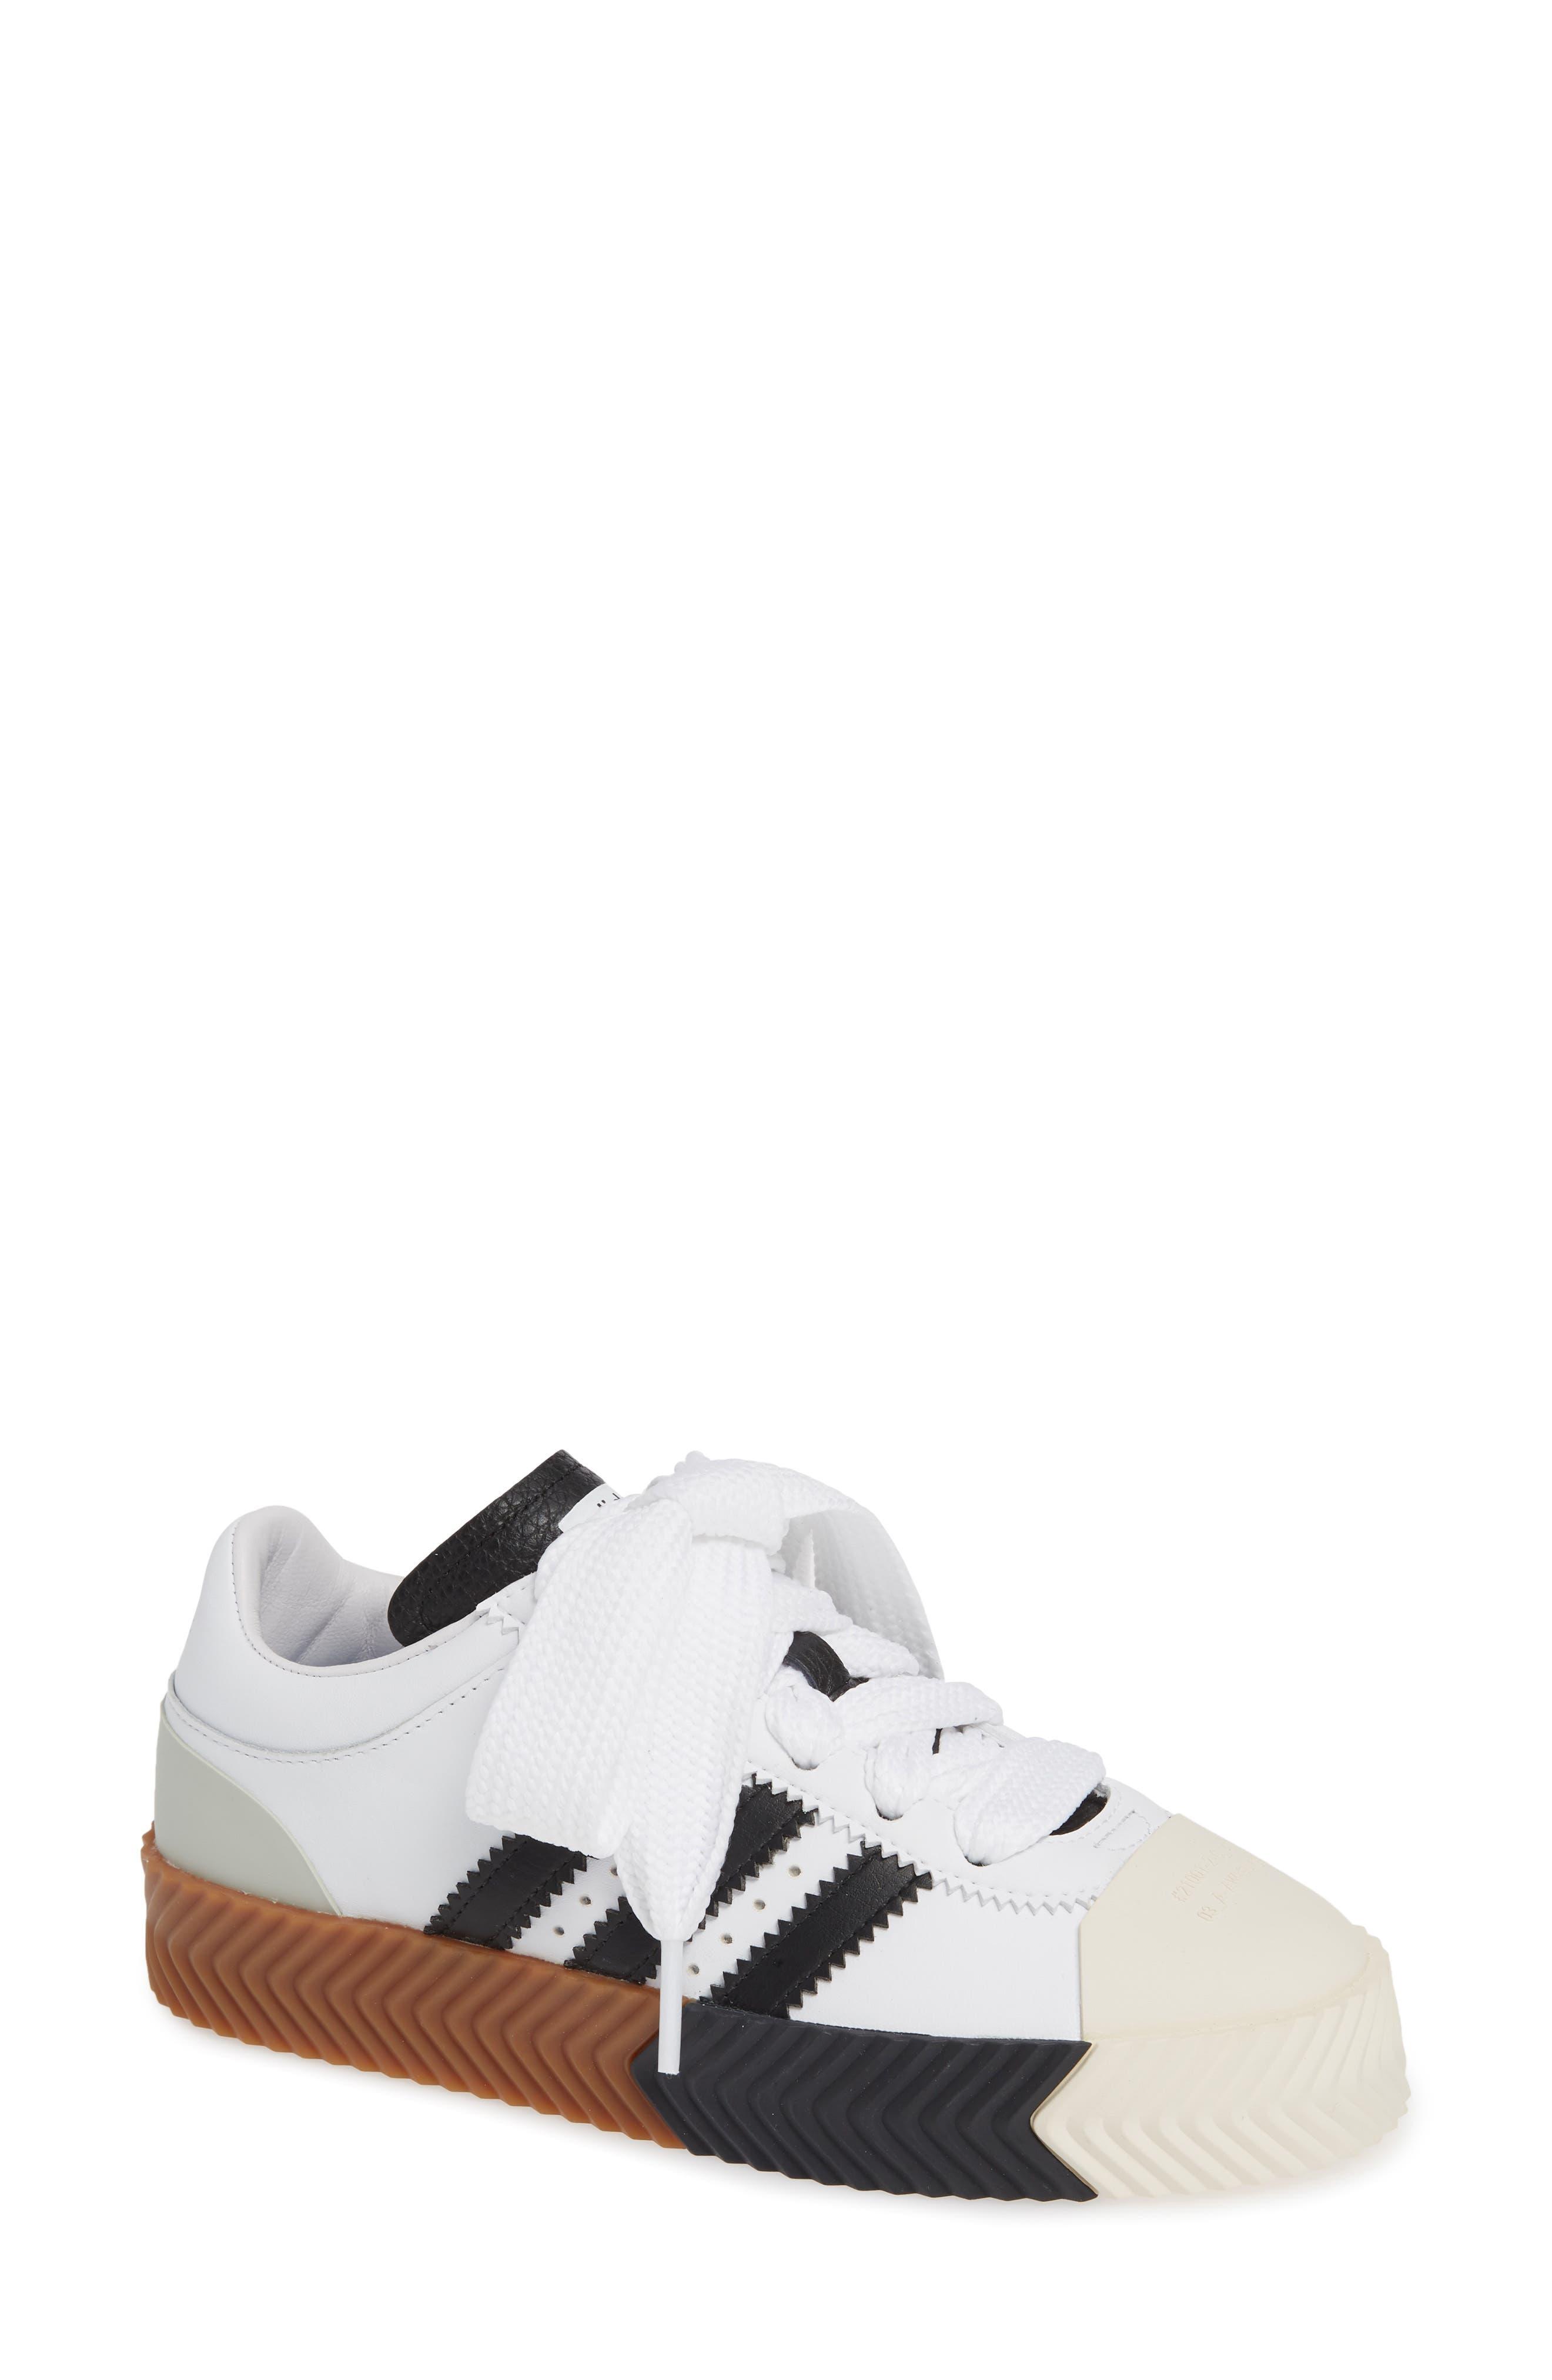 Skate Super Sneaker,                         Main,                         color, WHITE/ BLACK/ BROWN